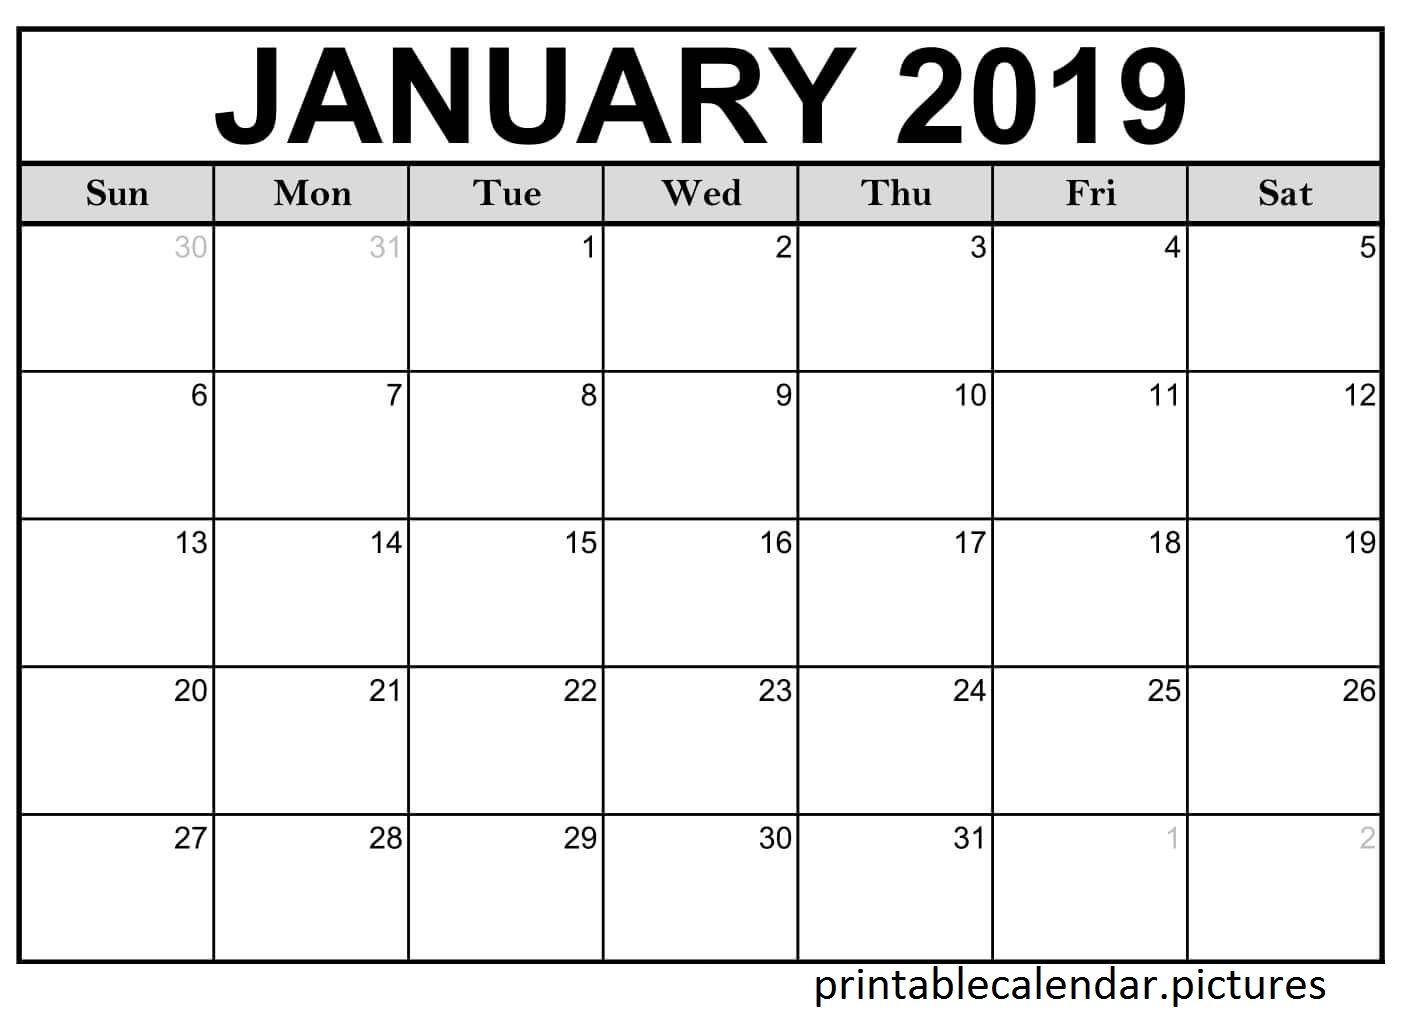 Printable Calendar January 2019 Monthly | Printable Calendar